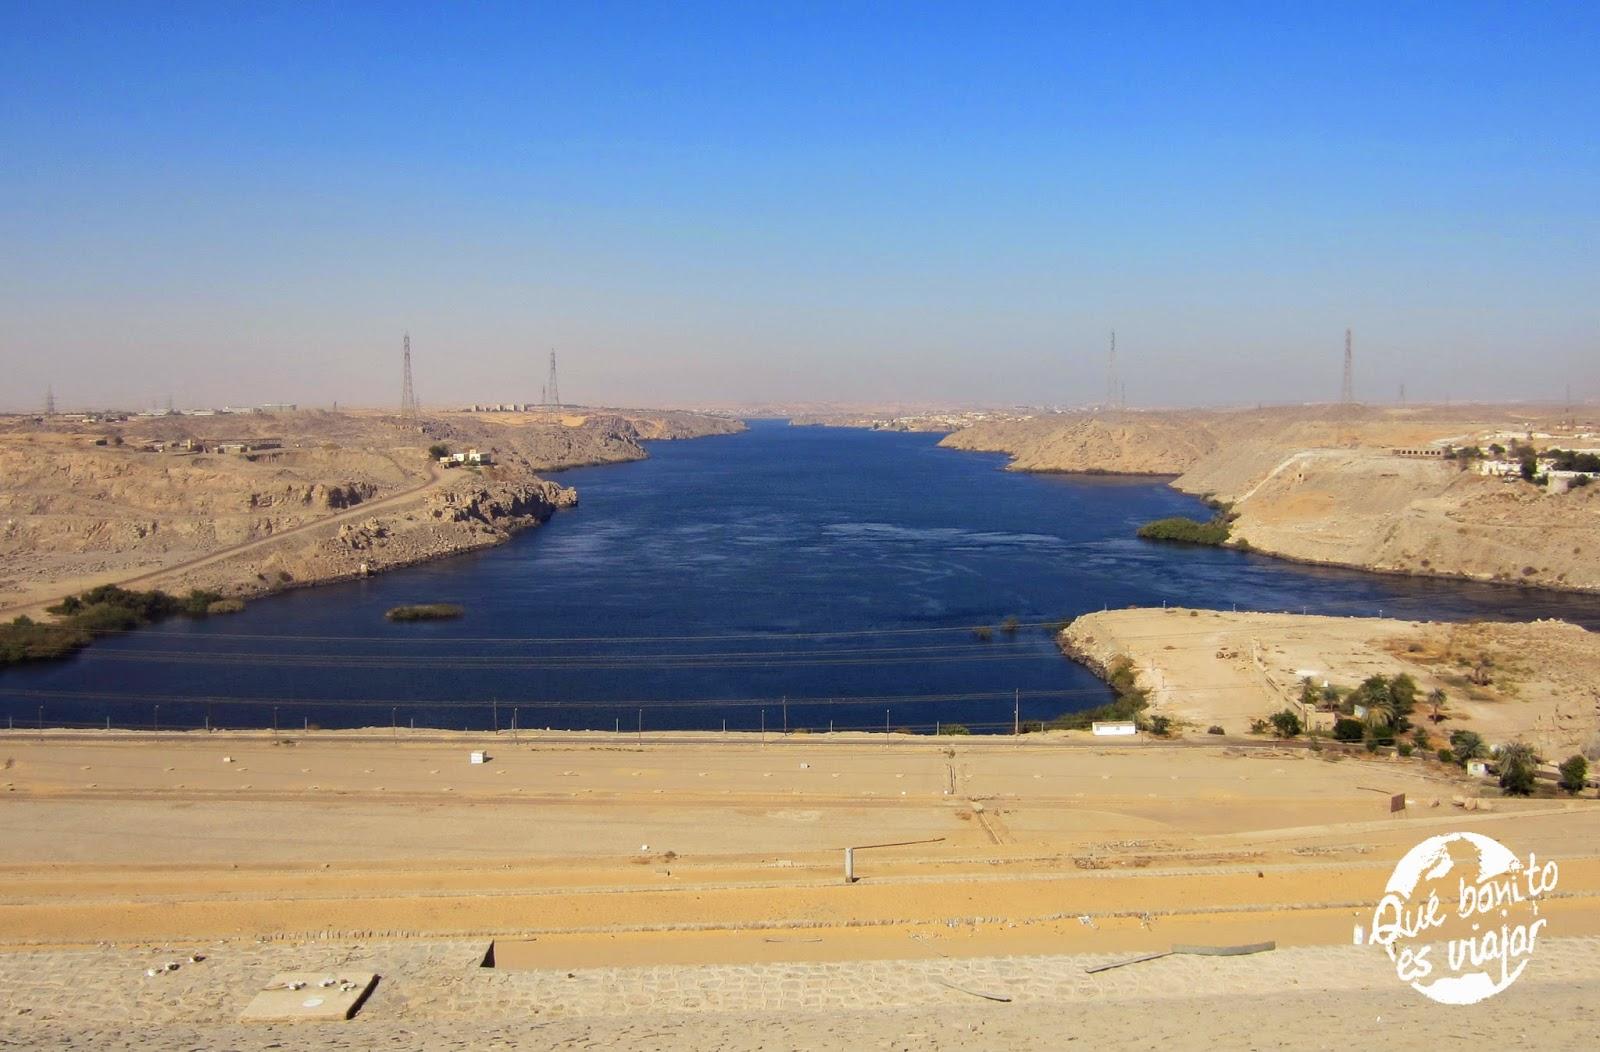 Abu Simbel presa de Aswan